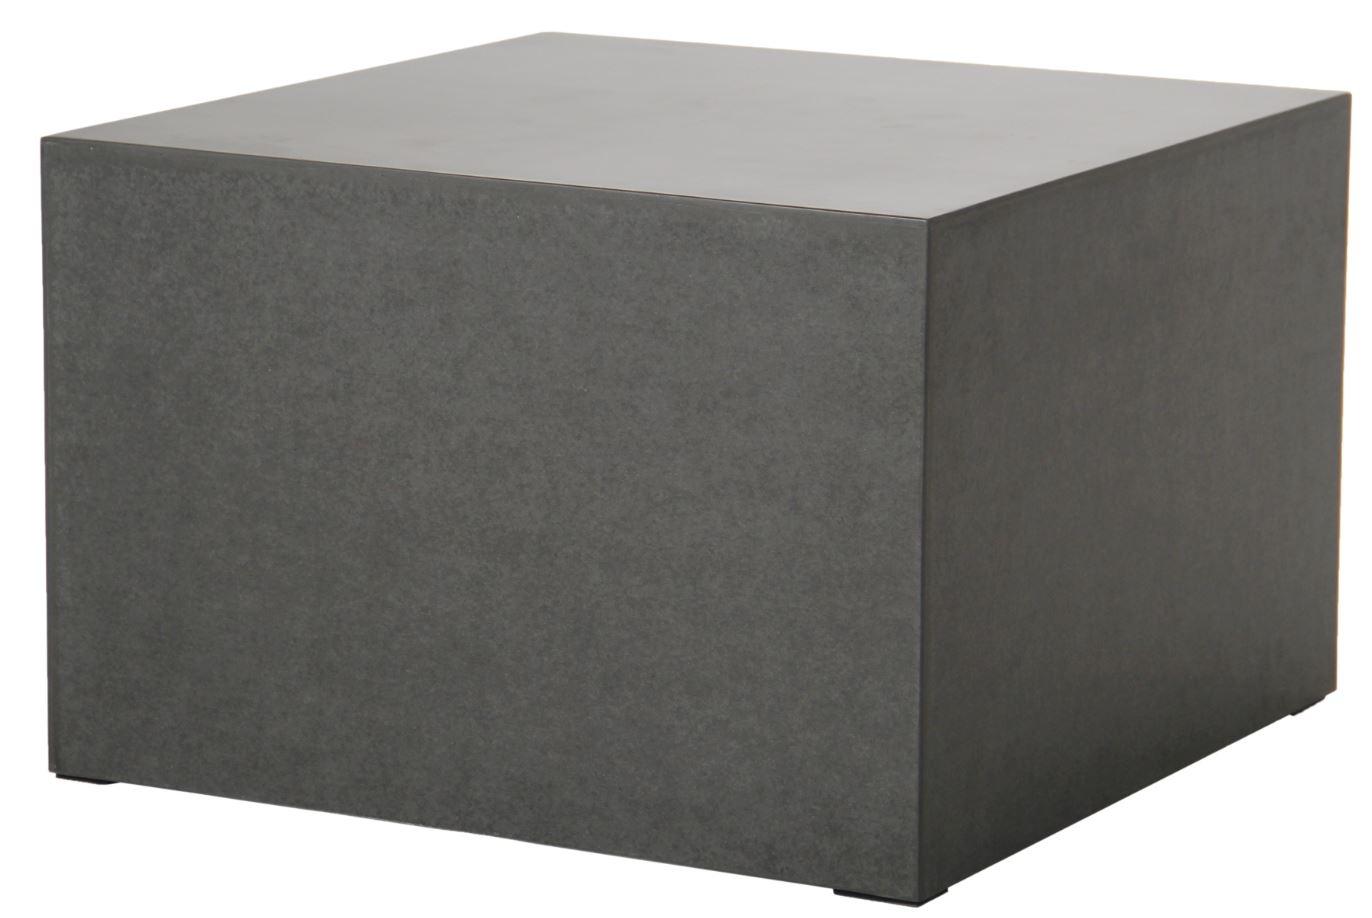 ROCKALL Lounge-Tisch